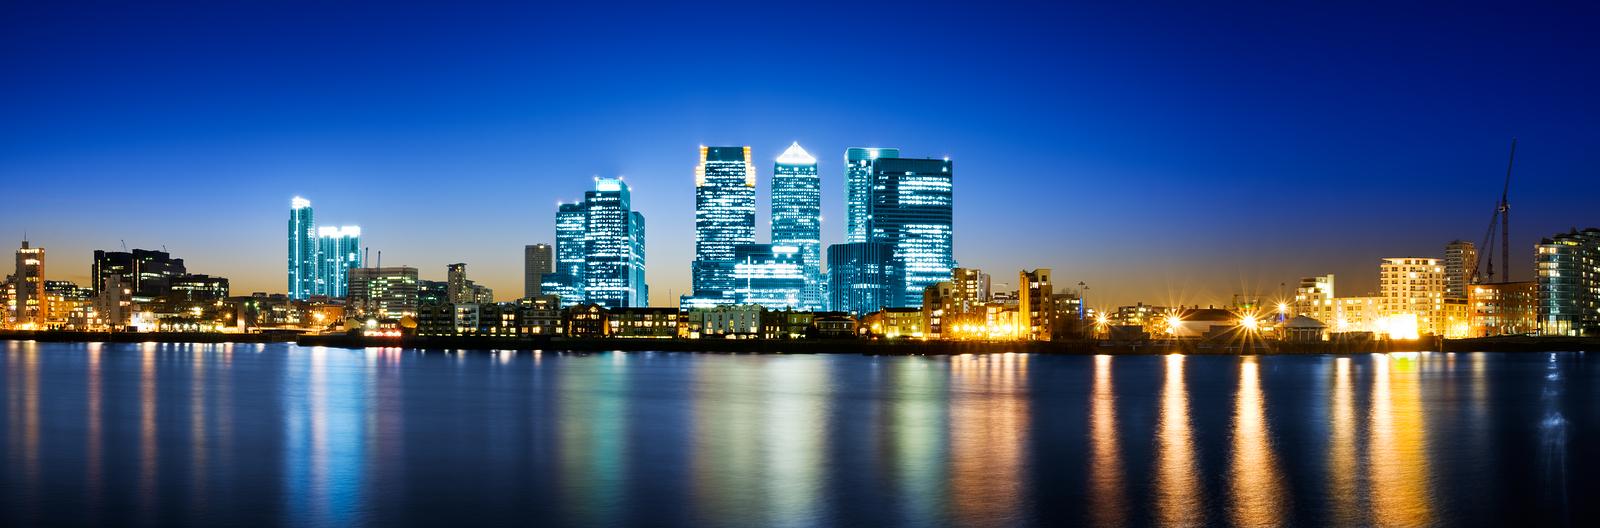 bigstock-Canary-Wharf-London-9575723